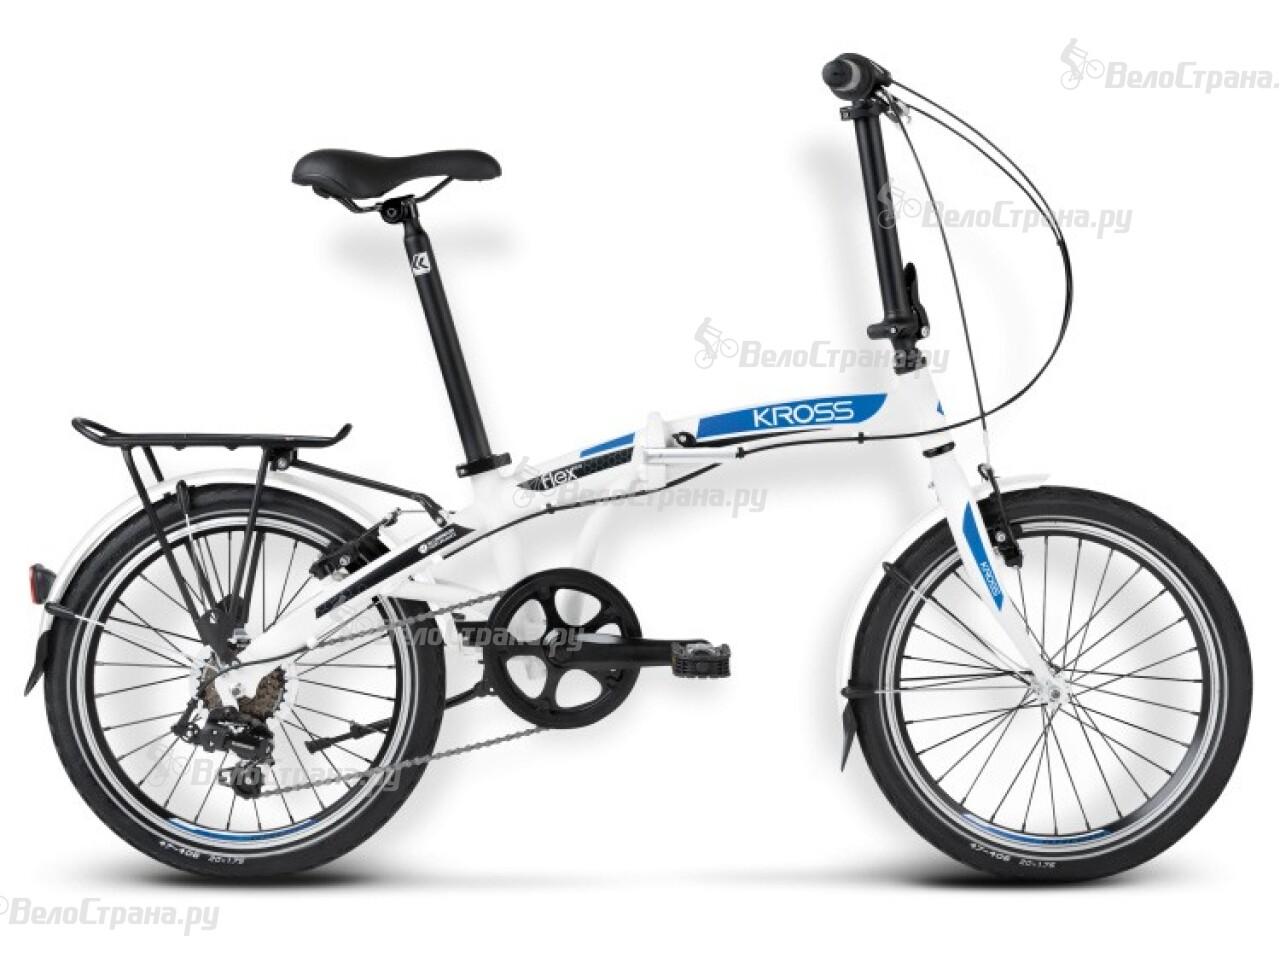 Велосипед Kross FLEX 2.0 (2016) велосипед kross flex 2 0 2015